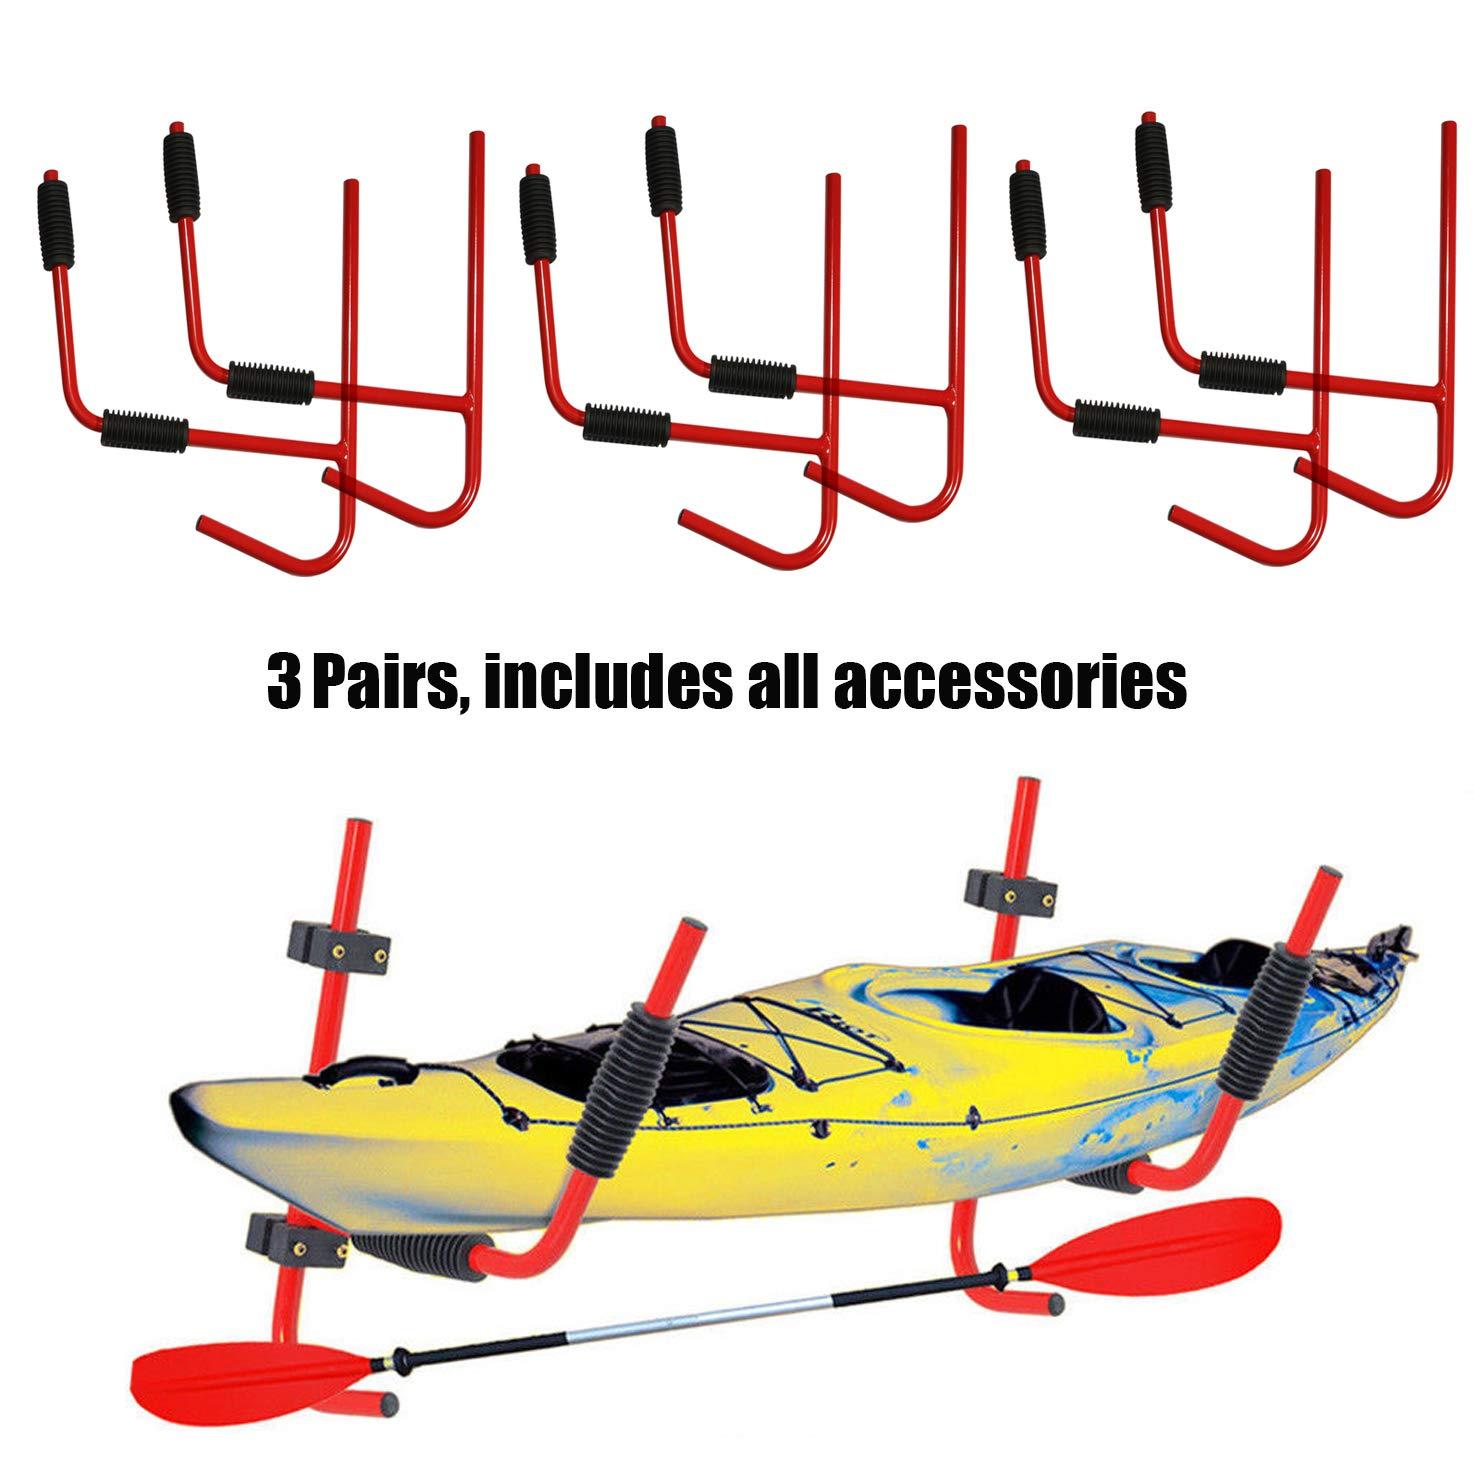 XFMT 3 Pairs Steel Kayak Ladder Wall Mount Storage Rack Surfboard Canoe Folding Hanger by XFMT